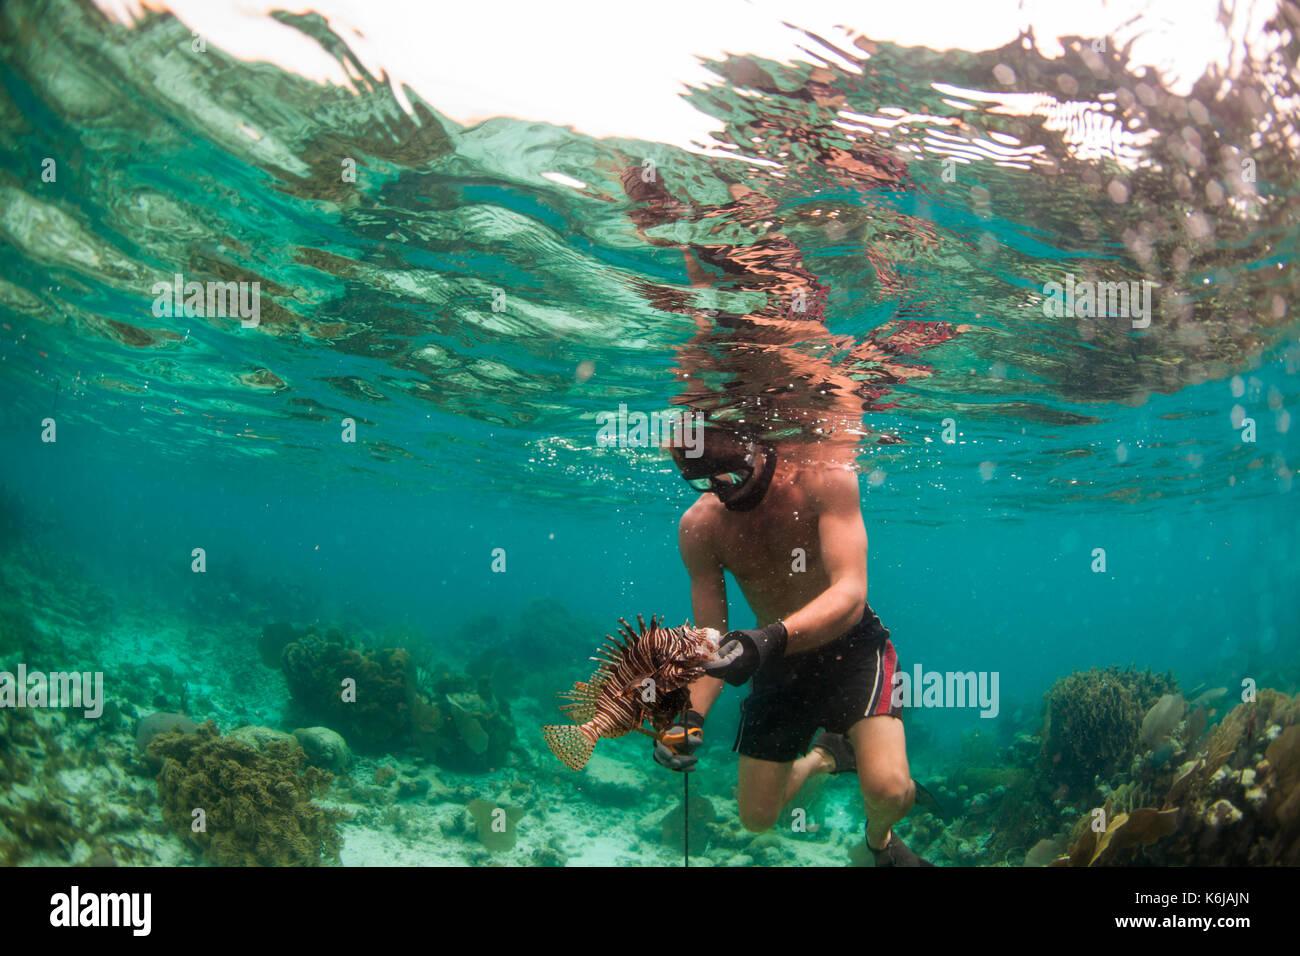 Man gently handling lion fish after spearing it, Atlantic Ocean - Stock Image